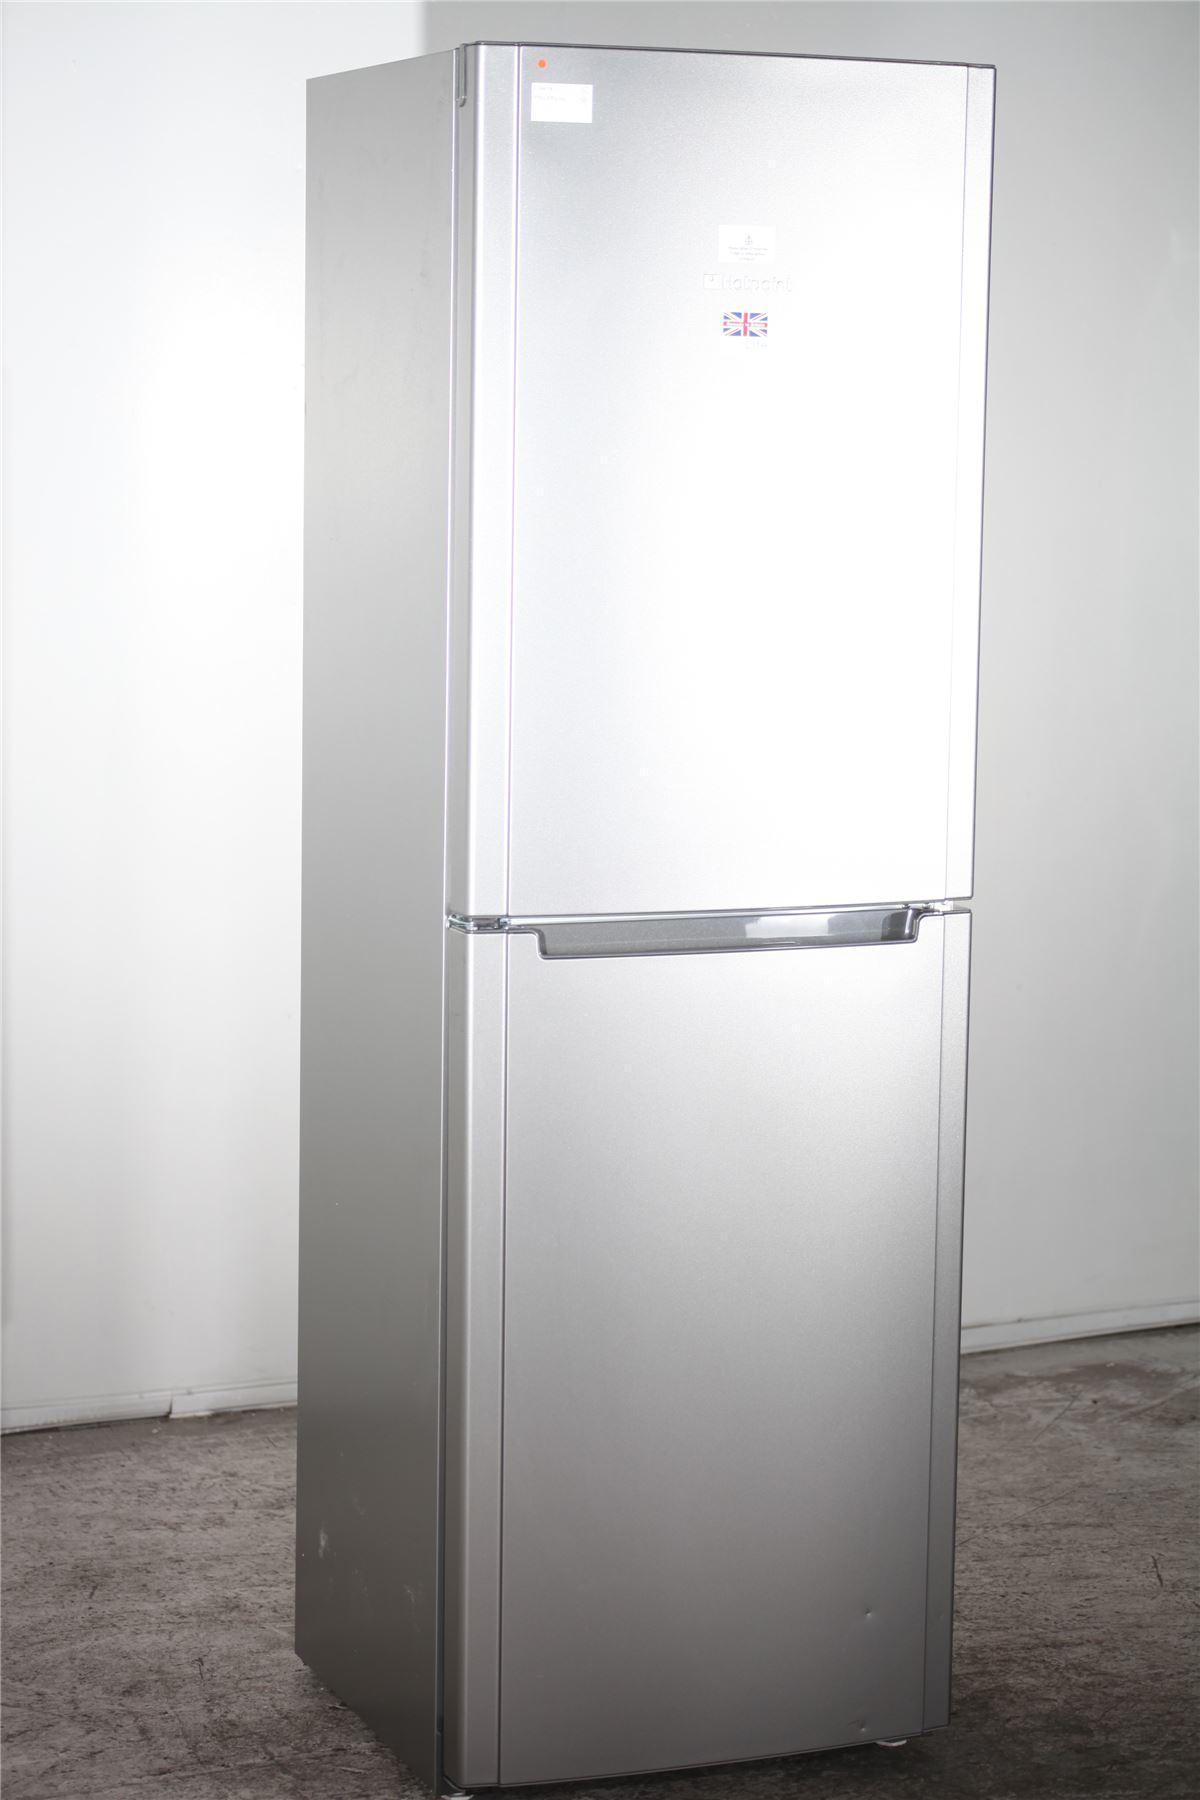 preloved hotpoint fridge freezer fsfl1810g silver. Black Bedroom Furniture Sets. Home Design Ideas